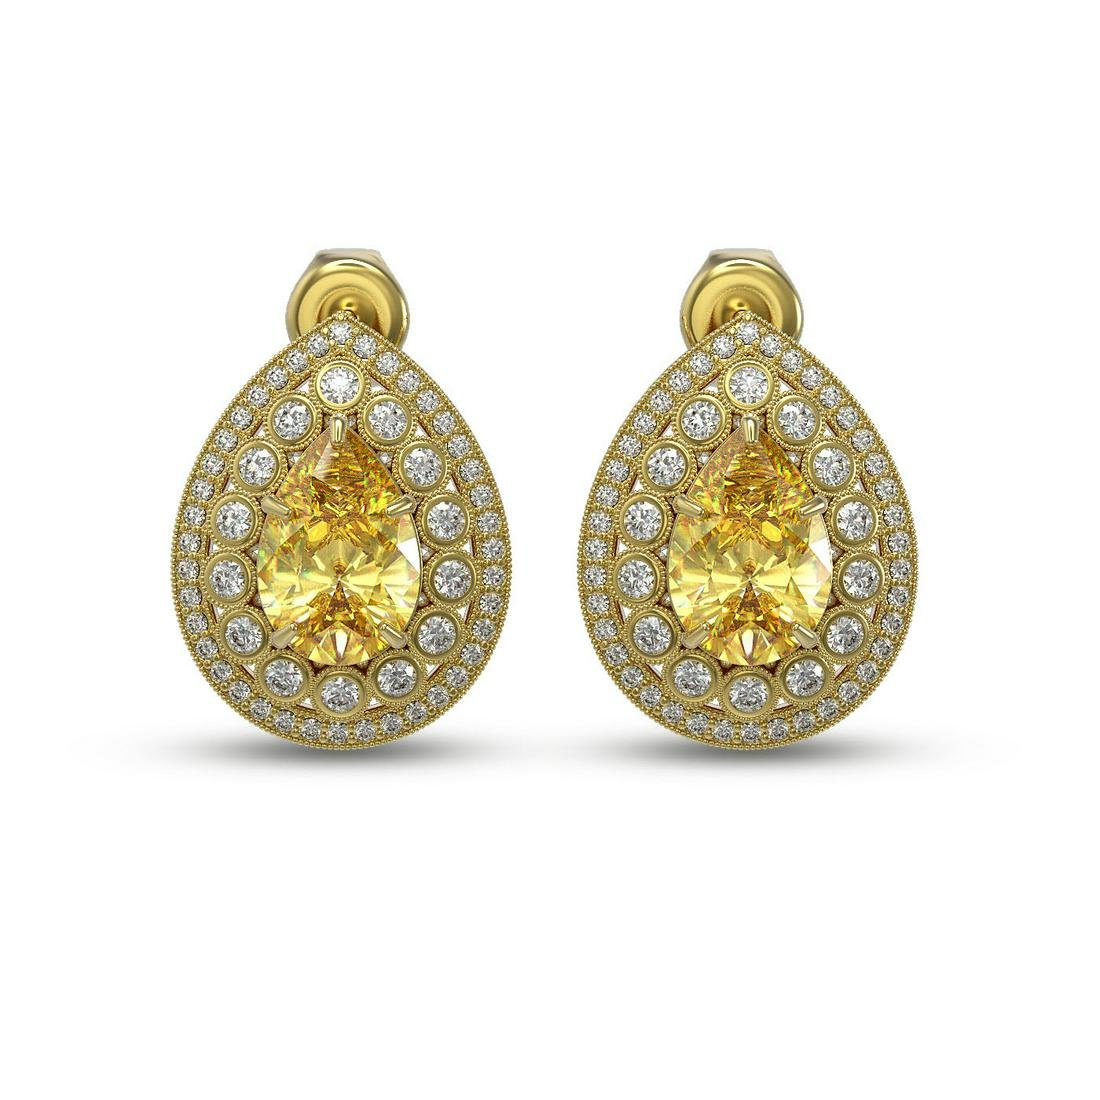 7.74 ctw Canary Citrine & Diamond Earrings 14K Yellow